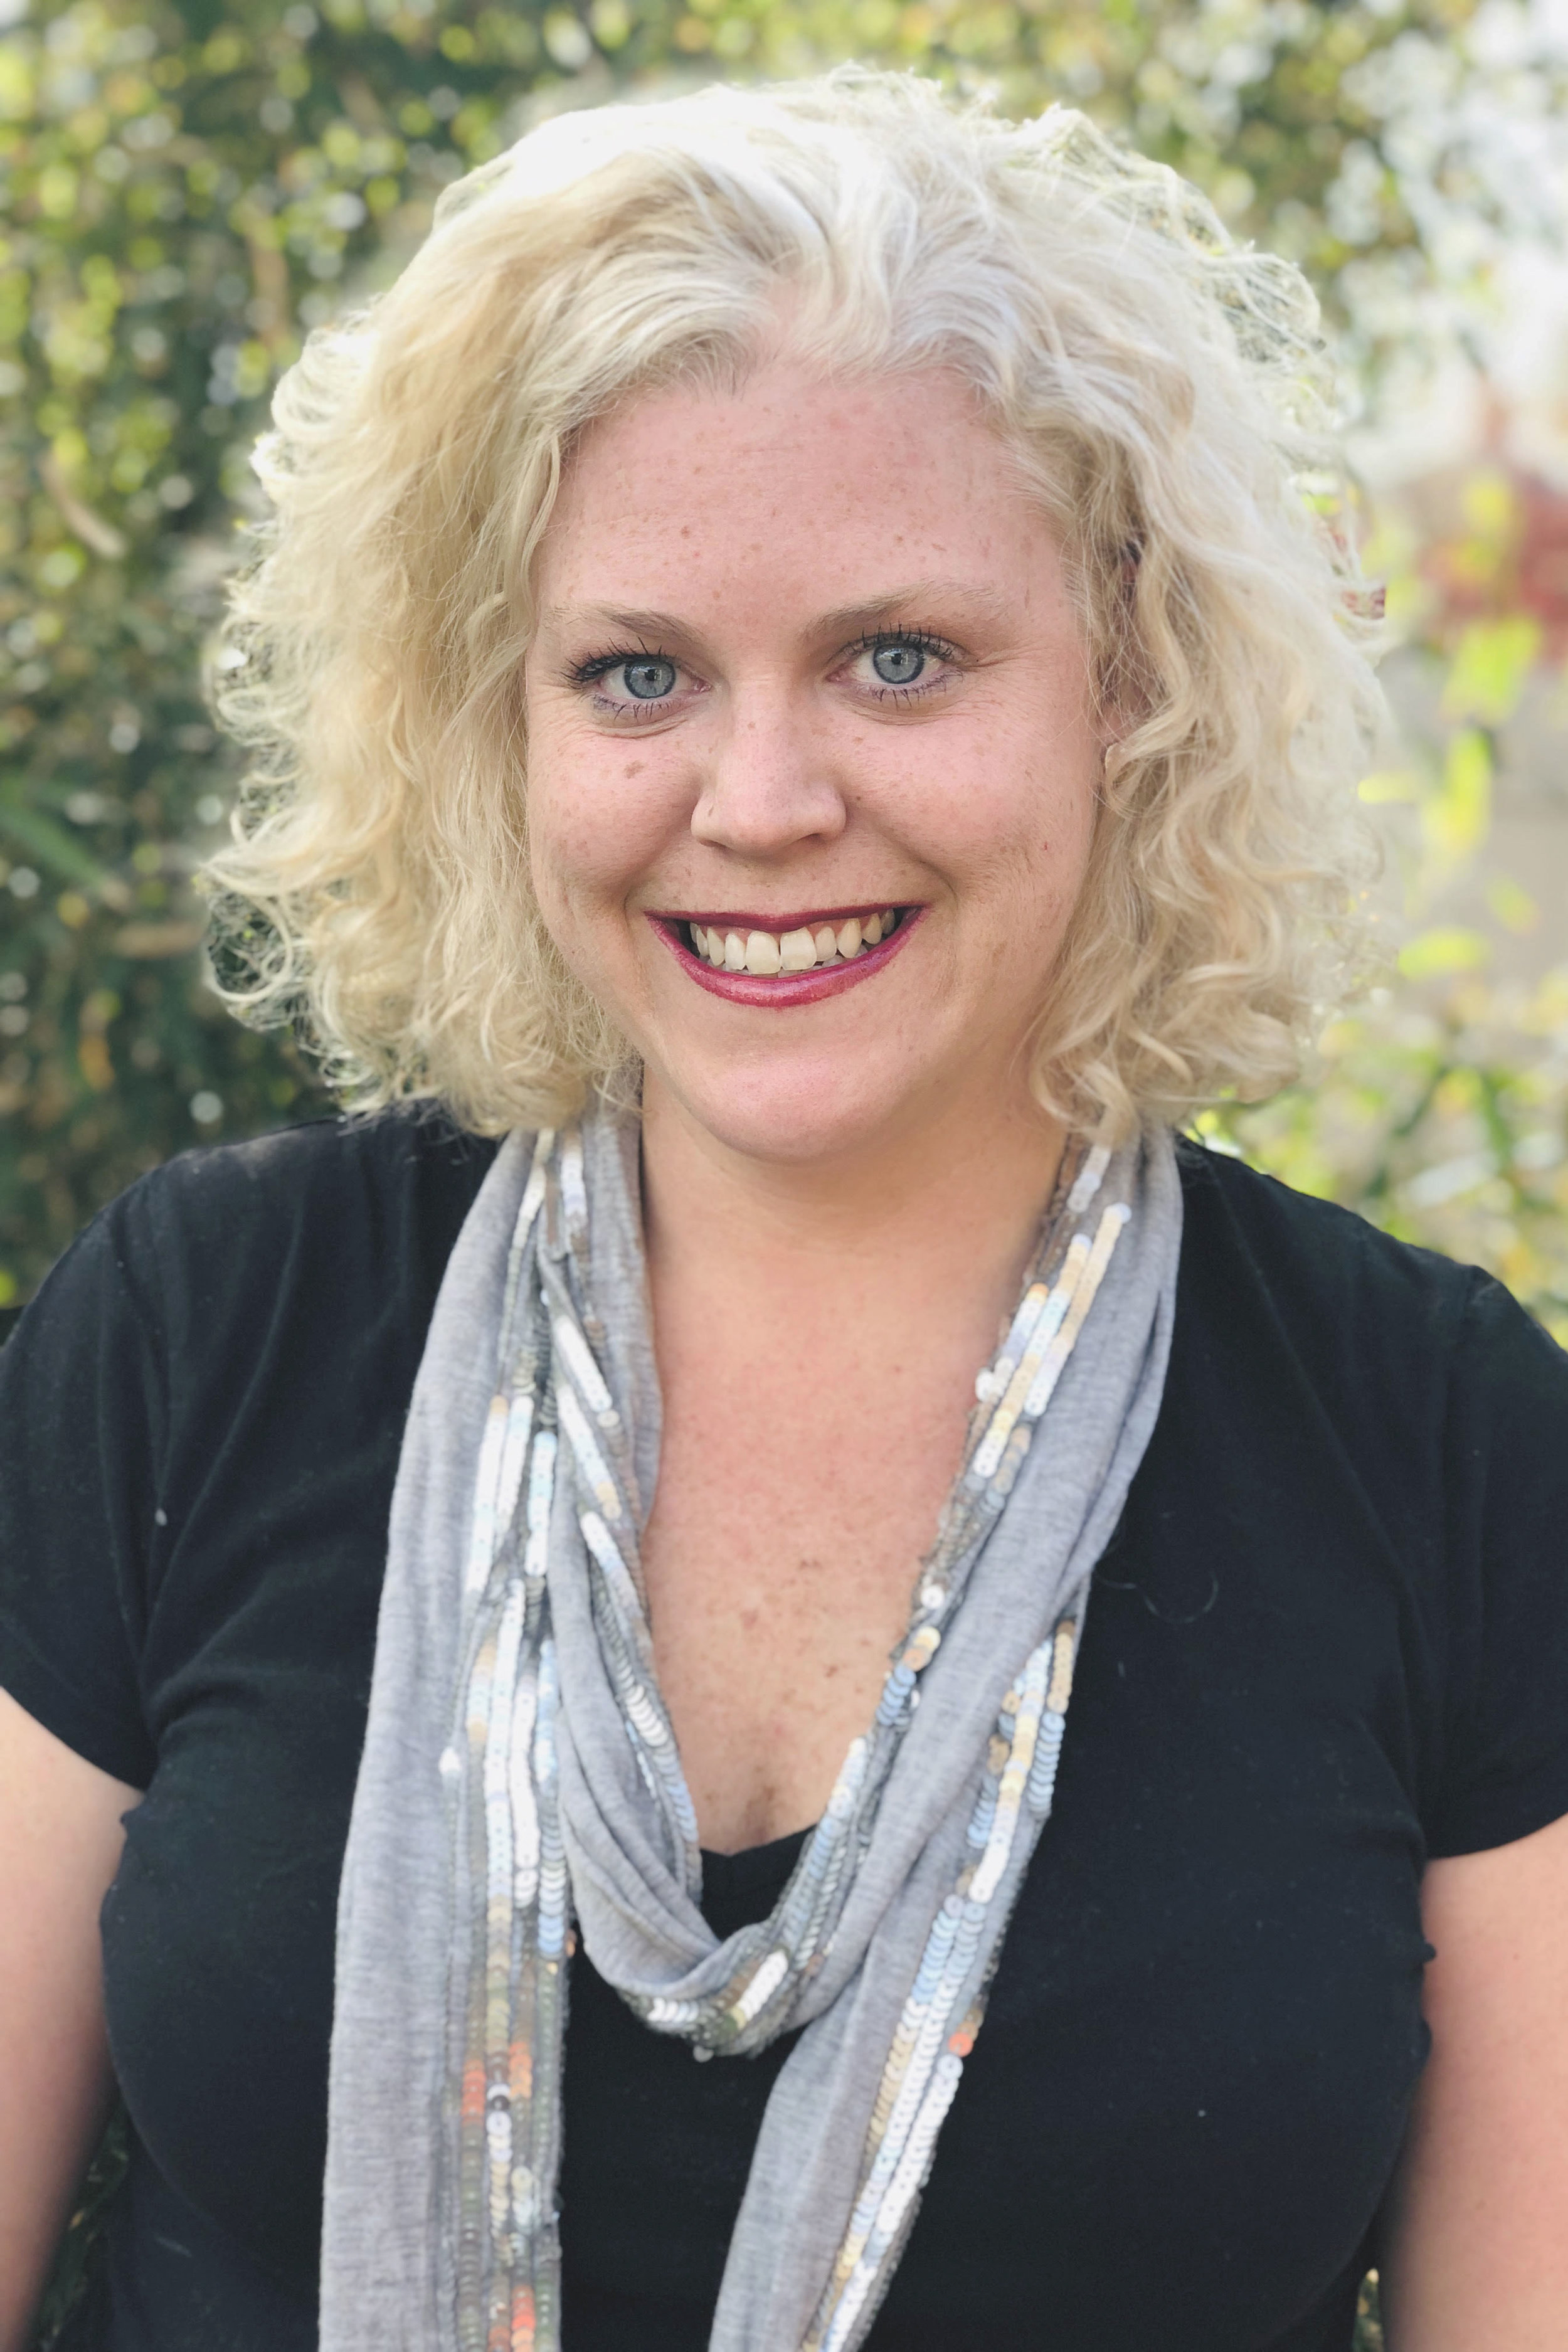 Caitlin Mclaughlin - Creative Associate of Interior design firm in Boston